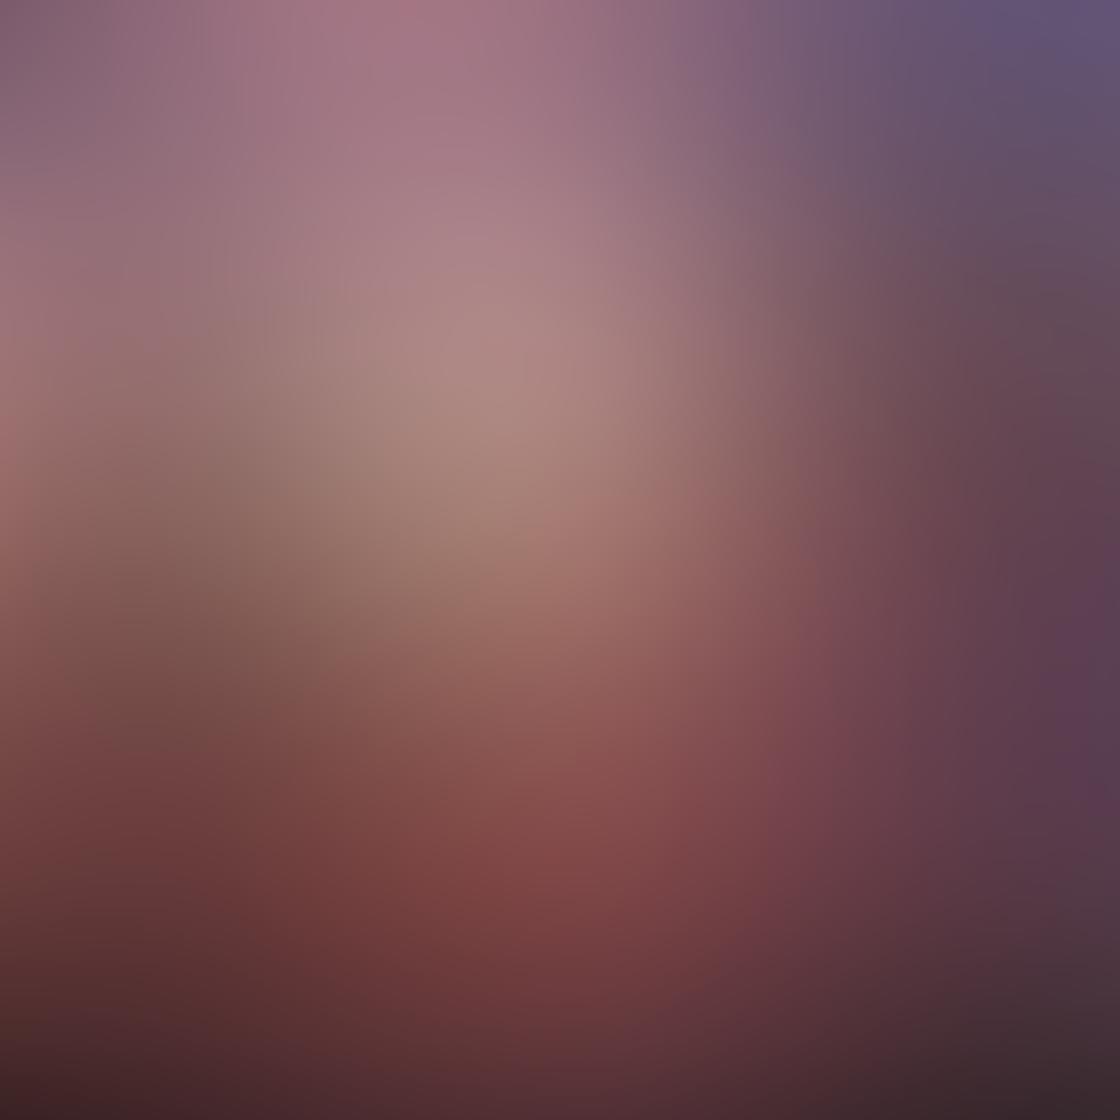 iPhone Sun Photo 22